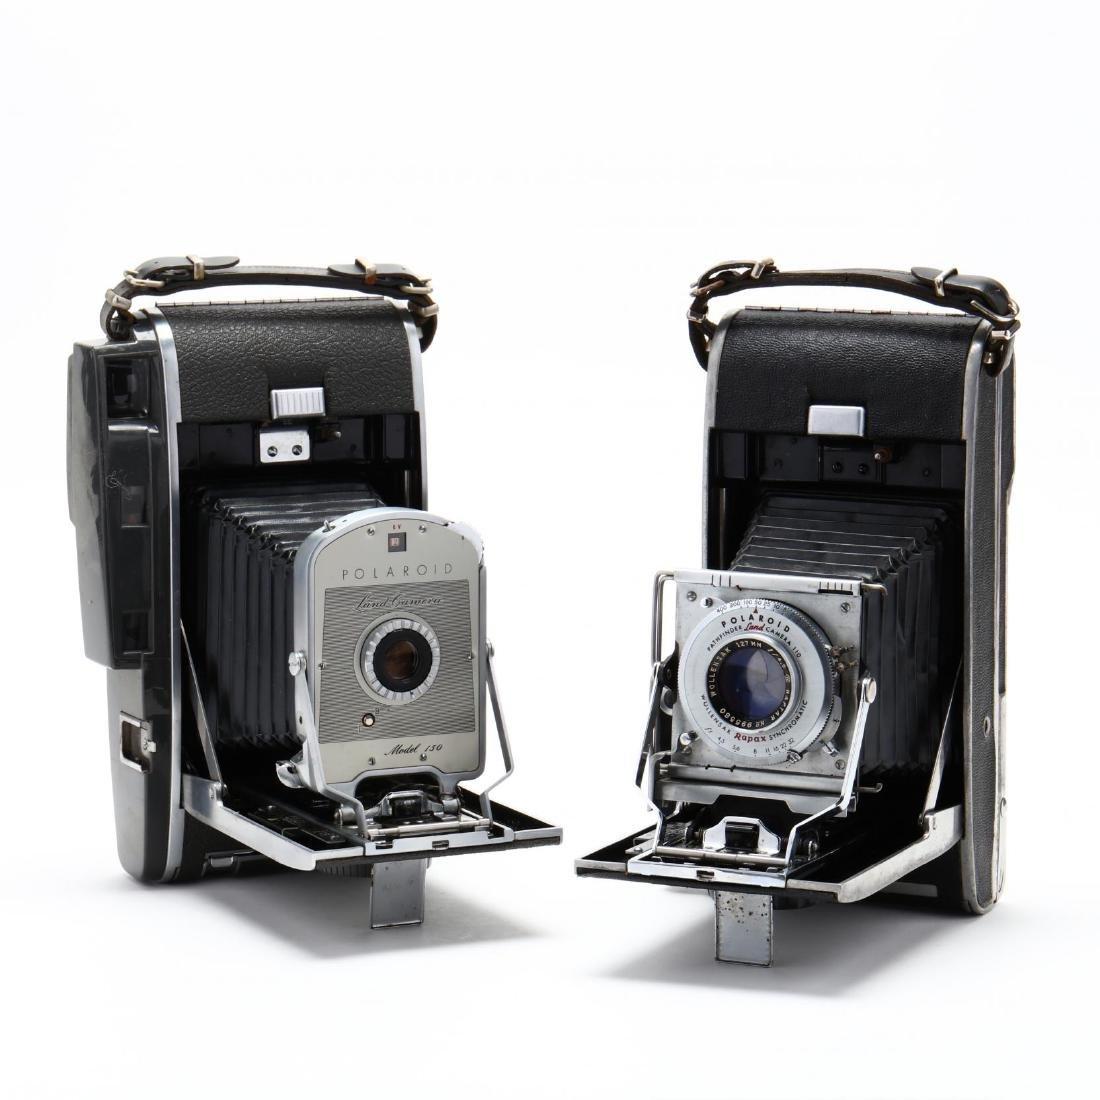 Two Vintage Polaroid Cameras